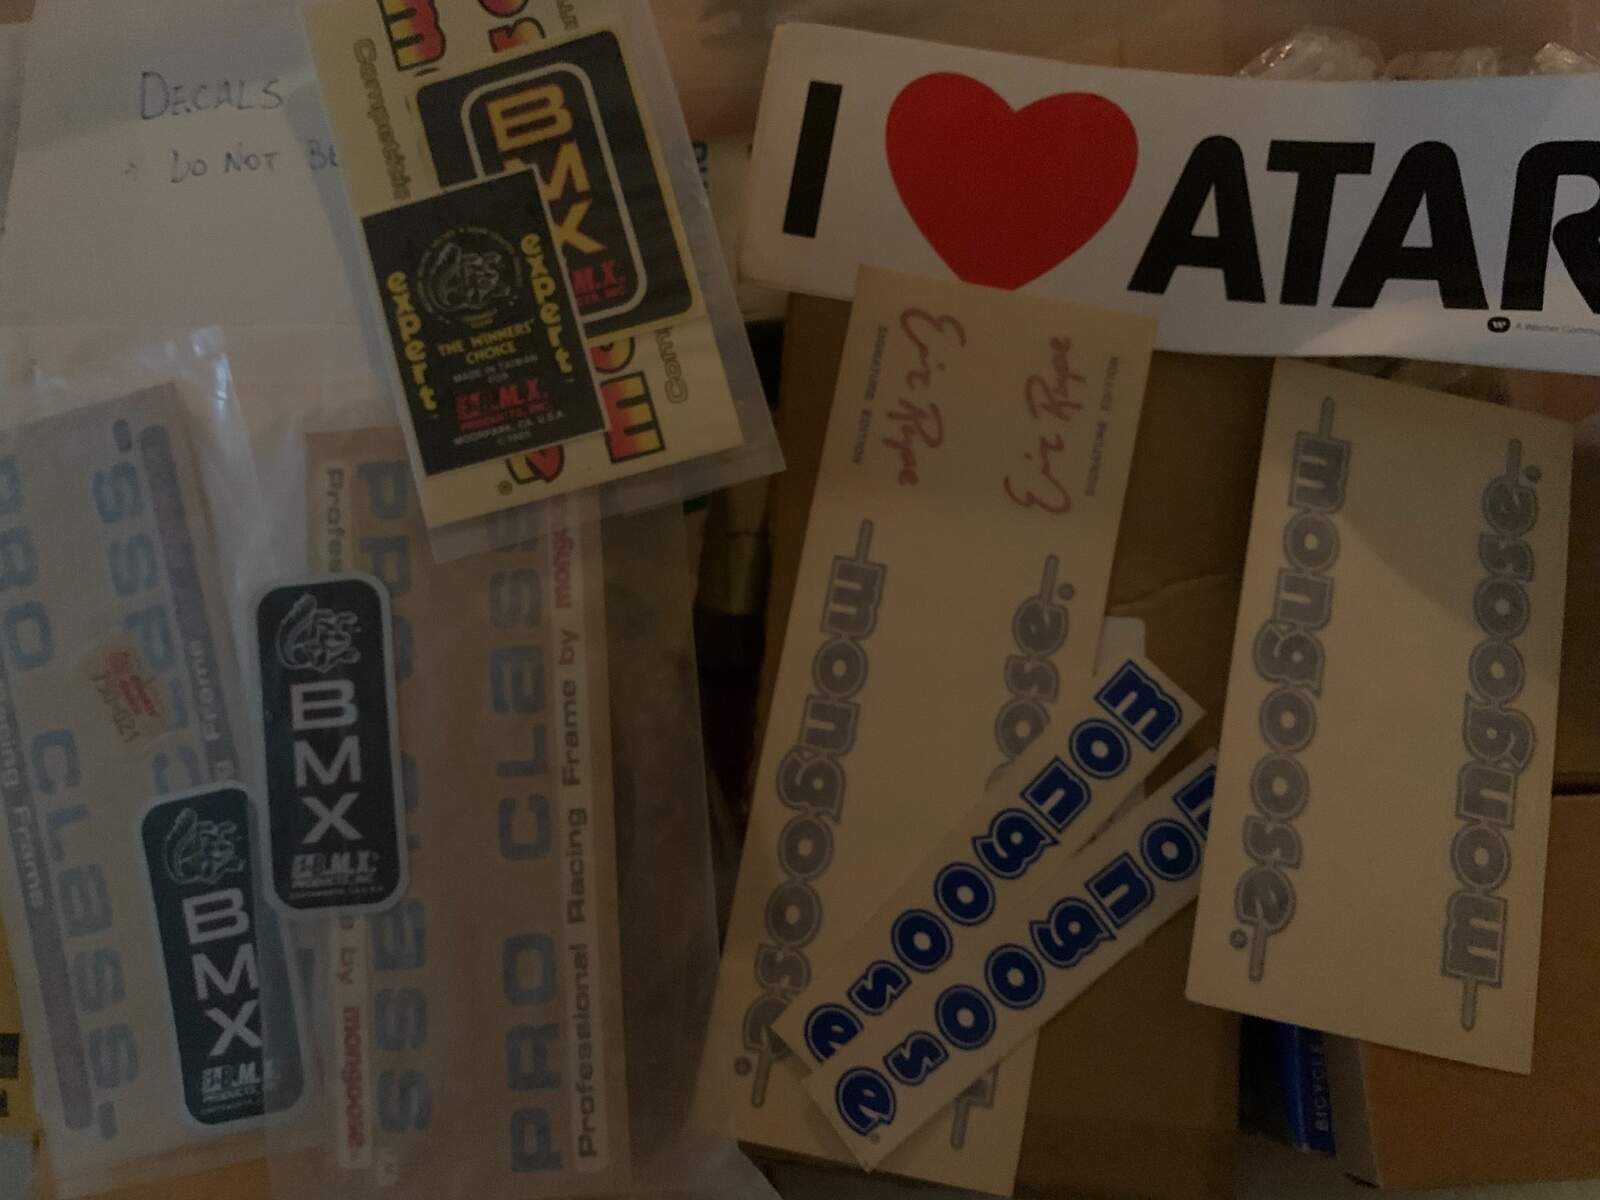 https://s3.amazonaws.com/uploads.bmxmuseum.com/user-images/584/05b3ff3b-03f4-47a6-8611-df90f23eec836122c106a9.jpeg